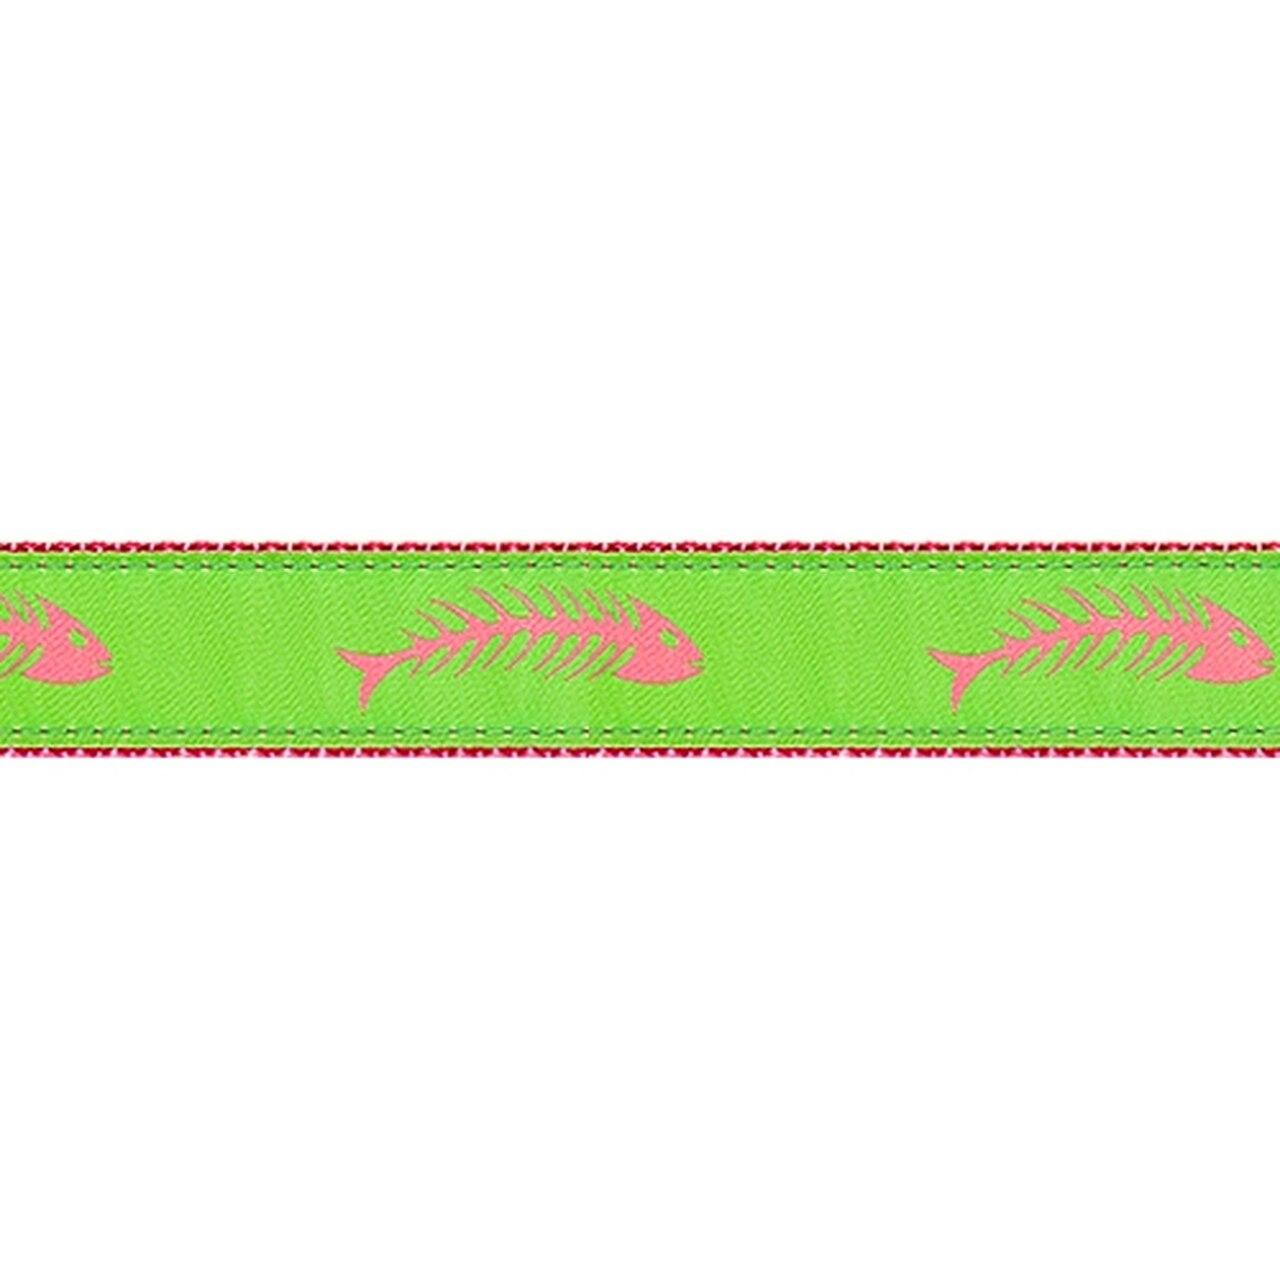 PRESTON Pink & Green Fishbone Dog Collar